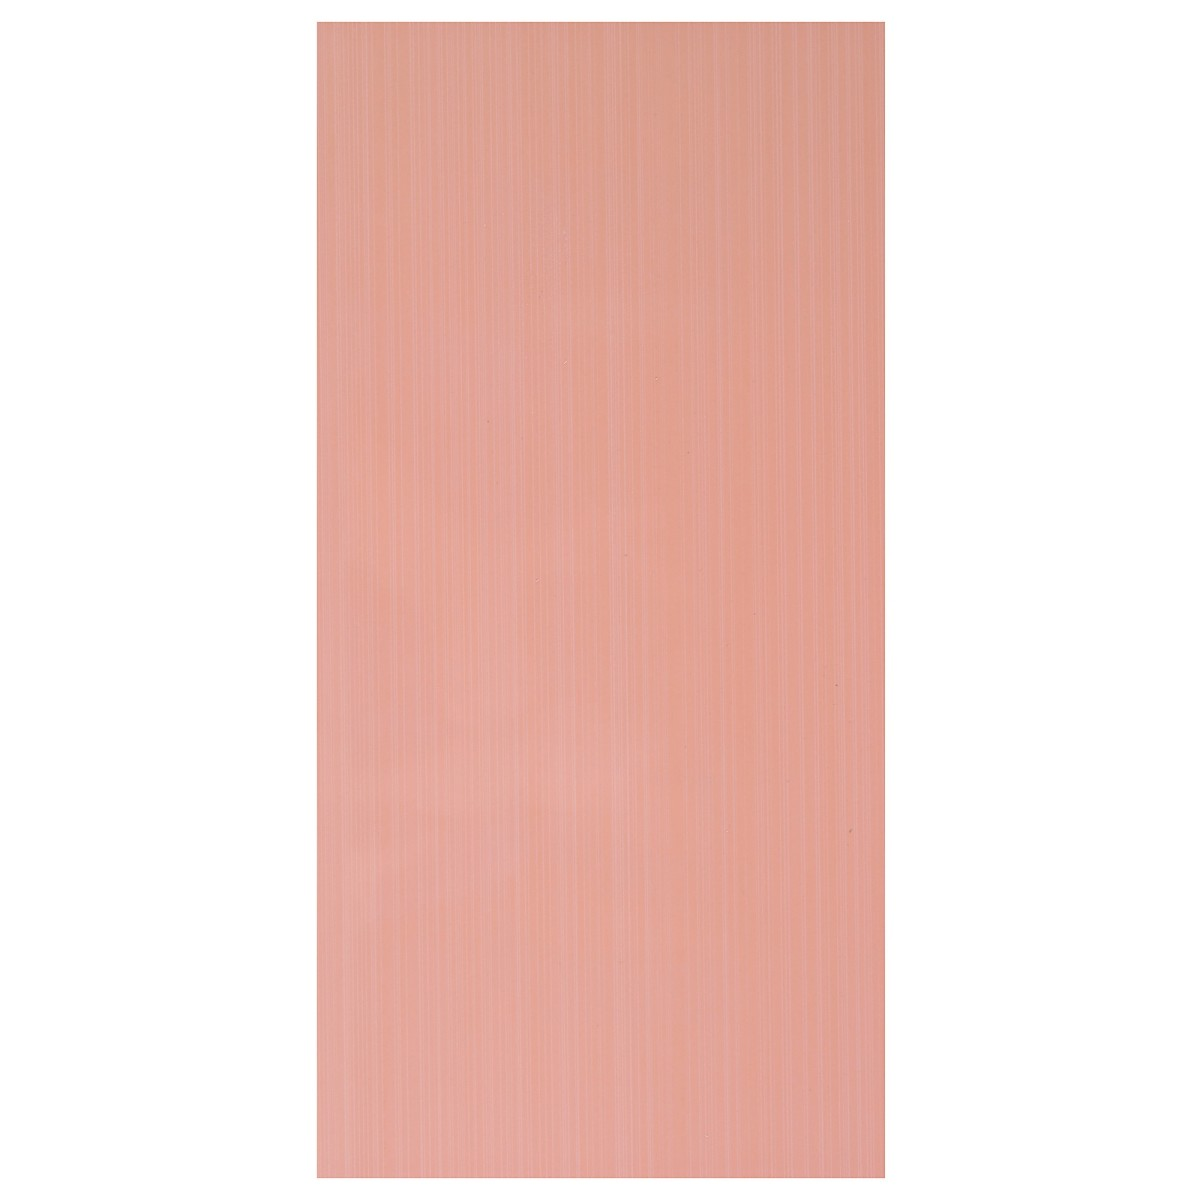 Плитка настенная Фрэска 20х40 см 1.2 м2 цвет оранжевый